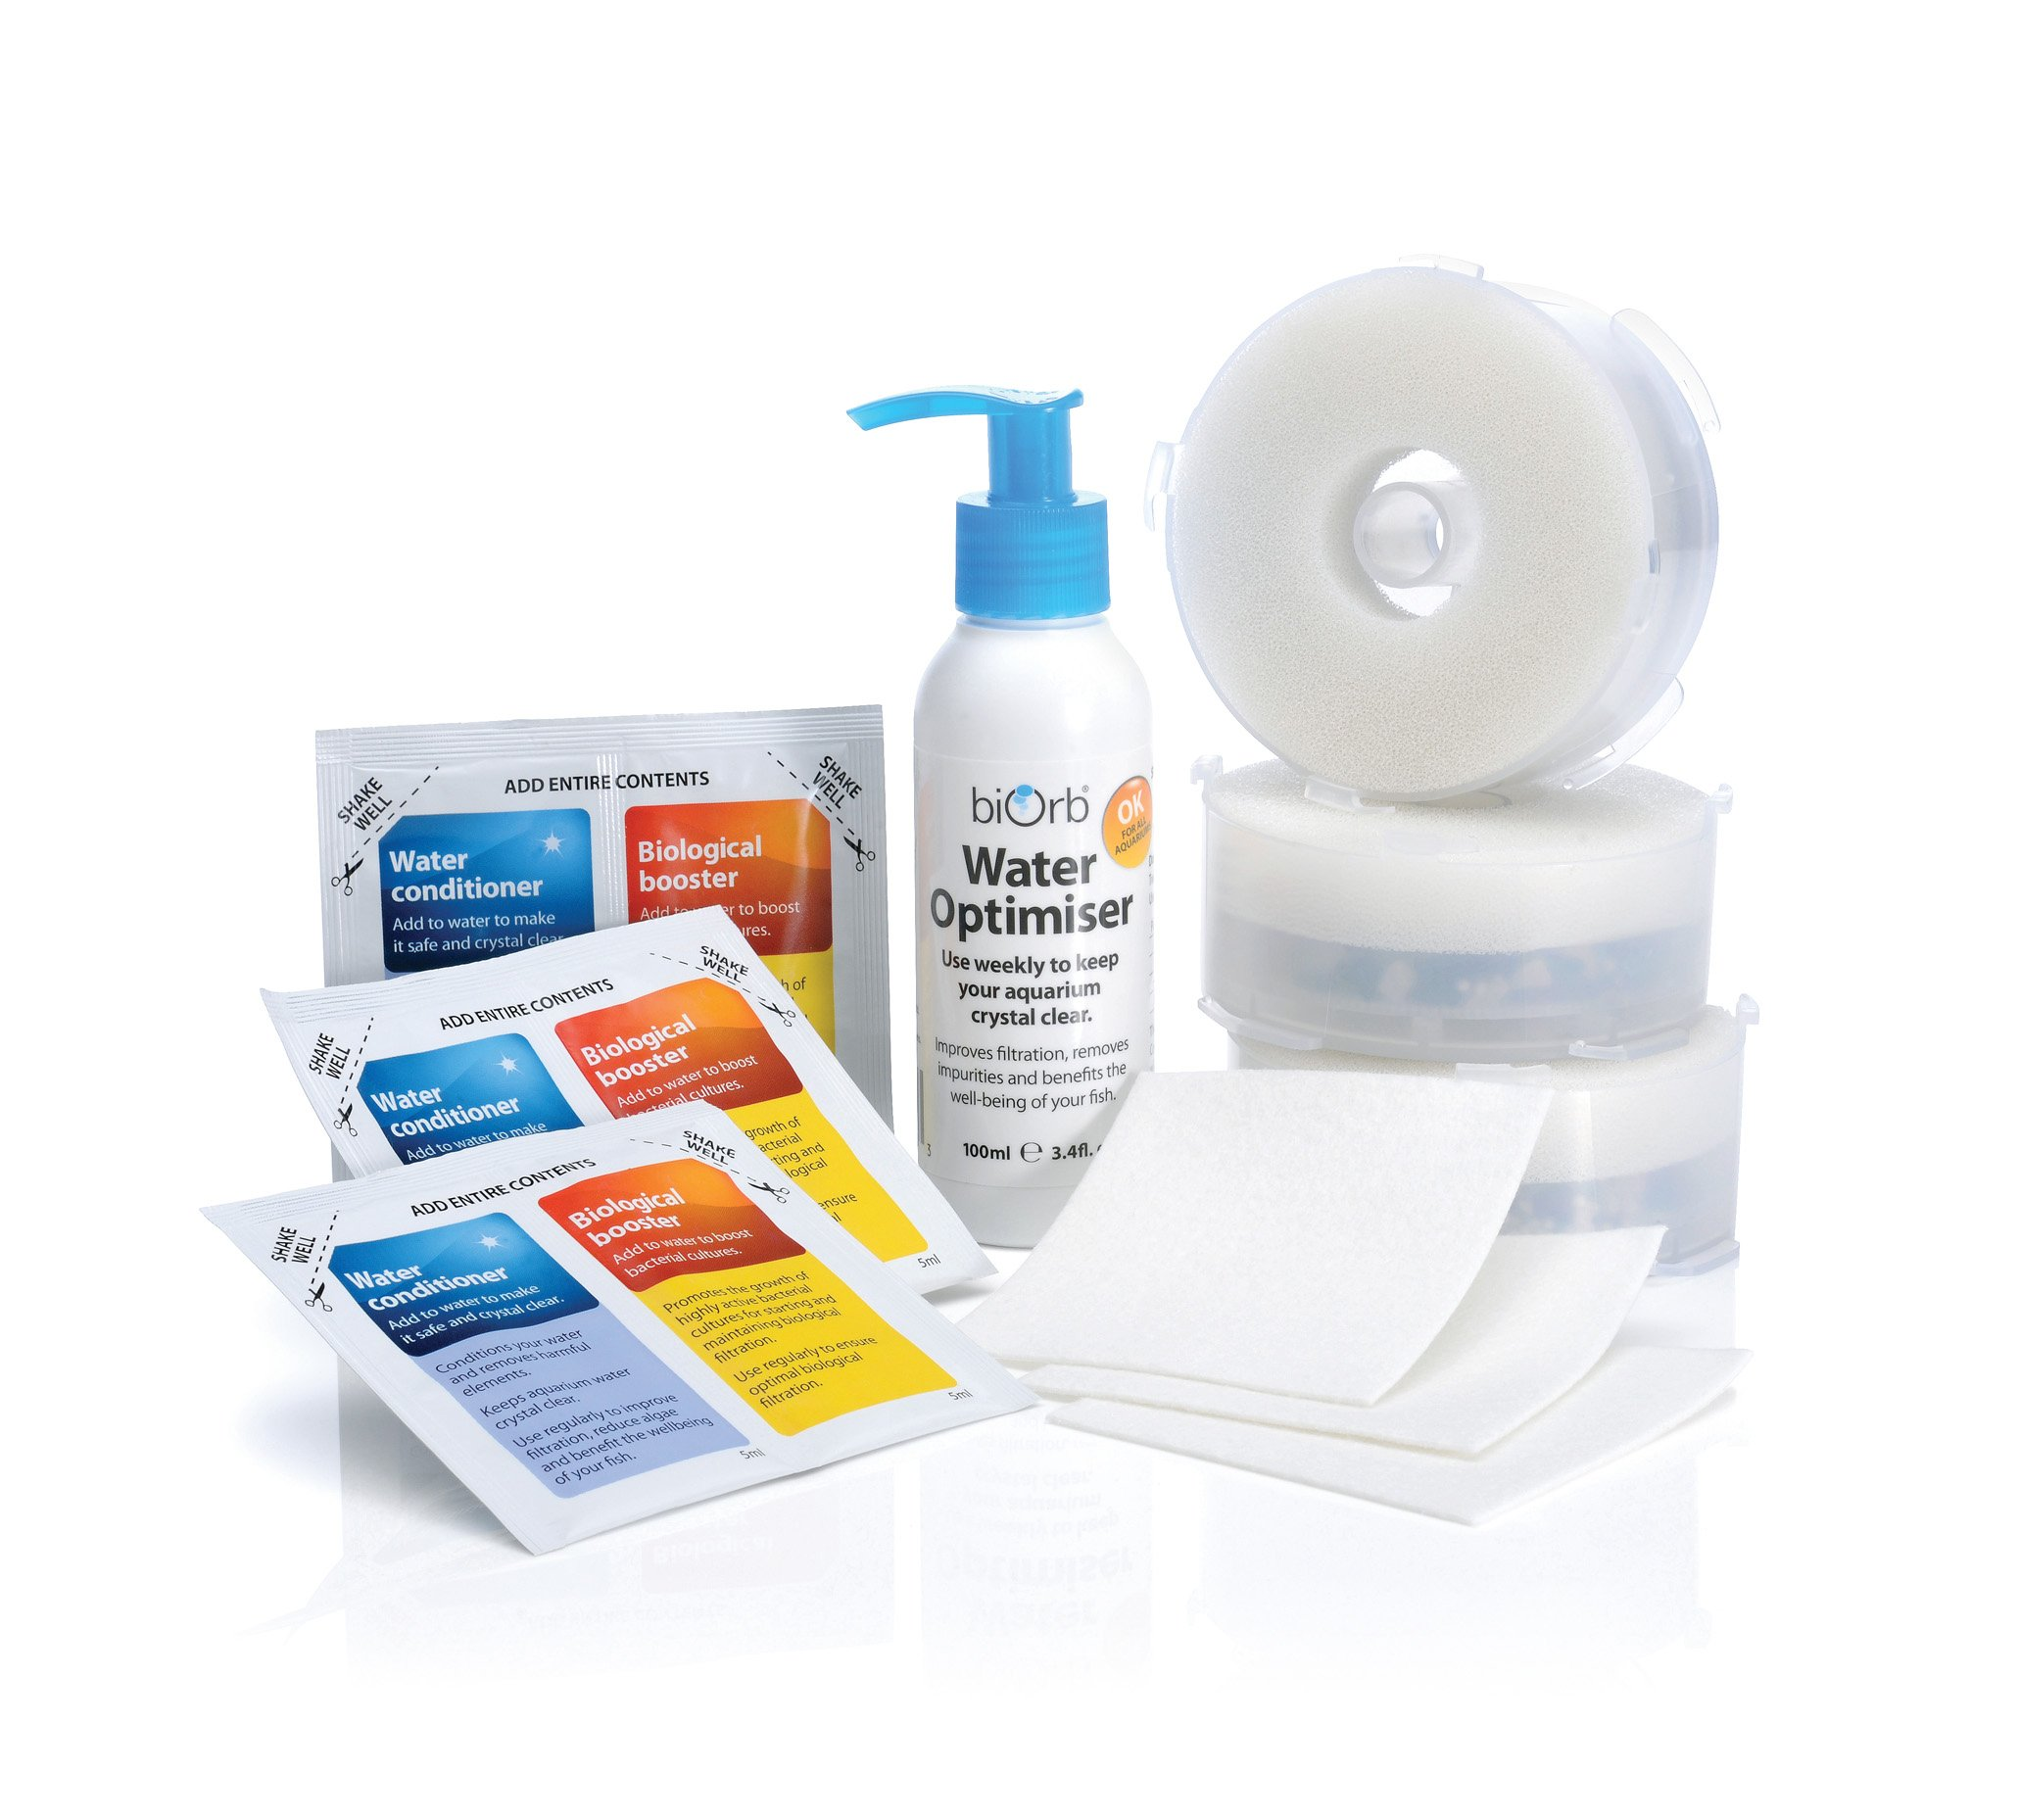 biOrb 46021.0 Service Kit 3 Plus Water Optimizer Aquariums